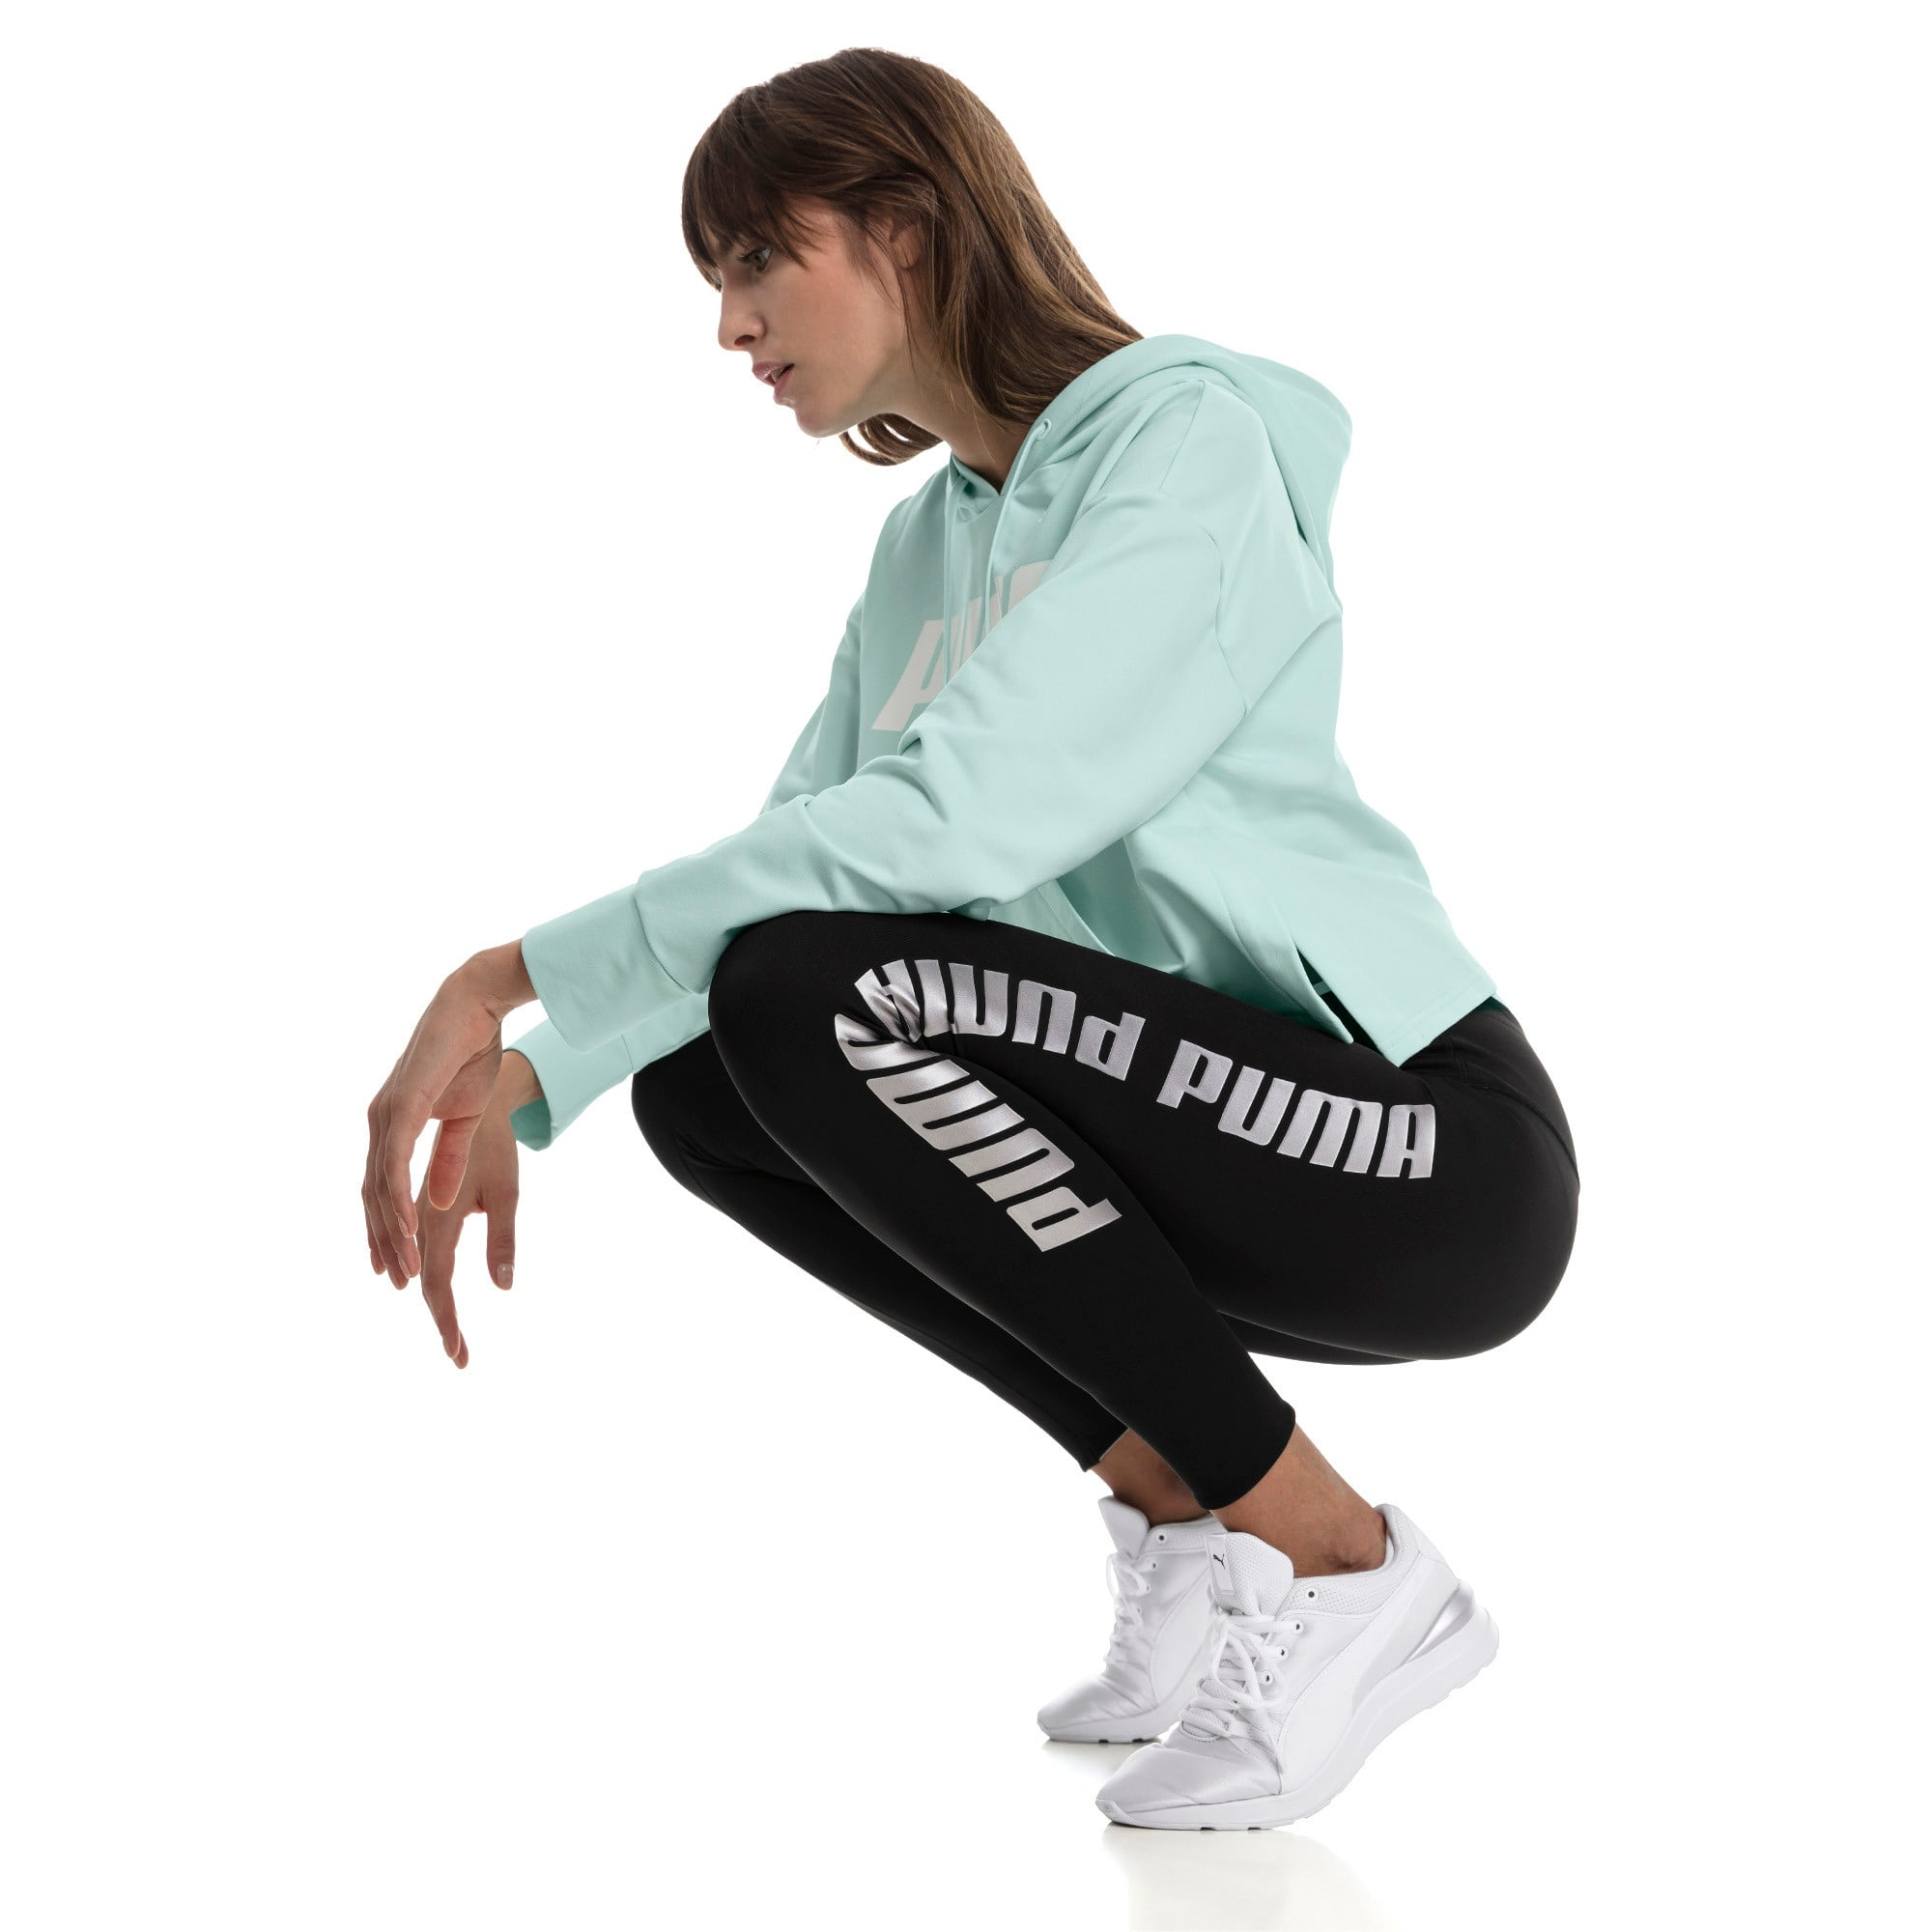 Thumbnail 3 of Modern Sports Fold Up Women's Leggings, Puma Black-fair aqua silver, medium